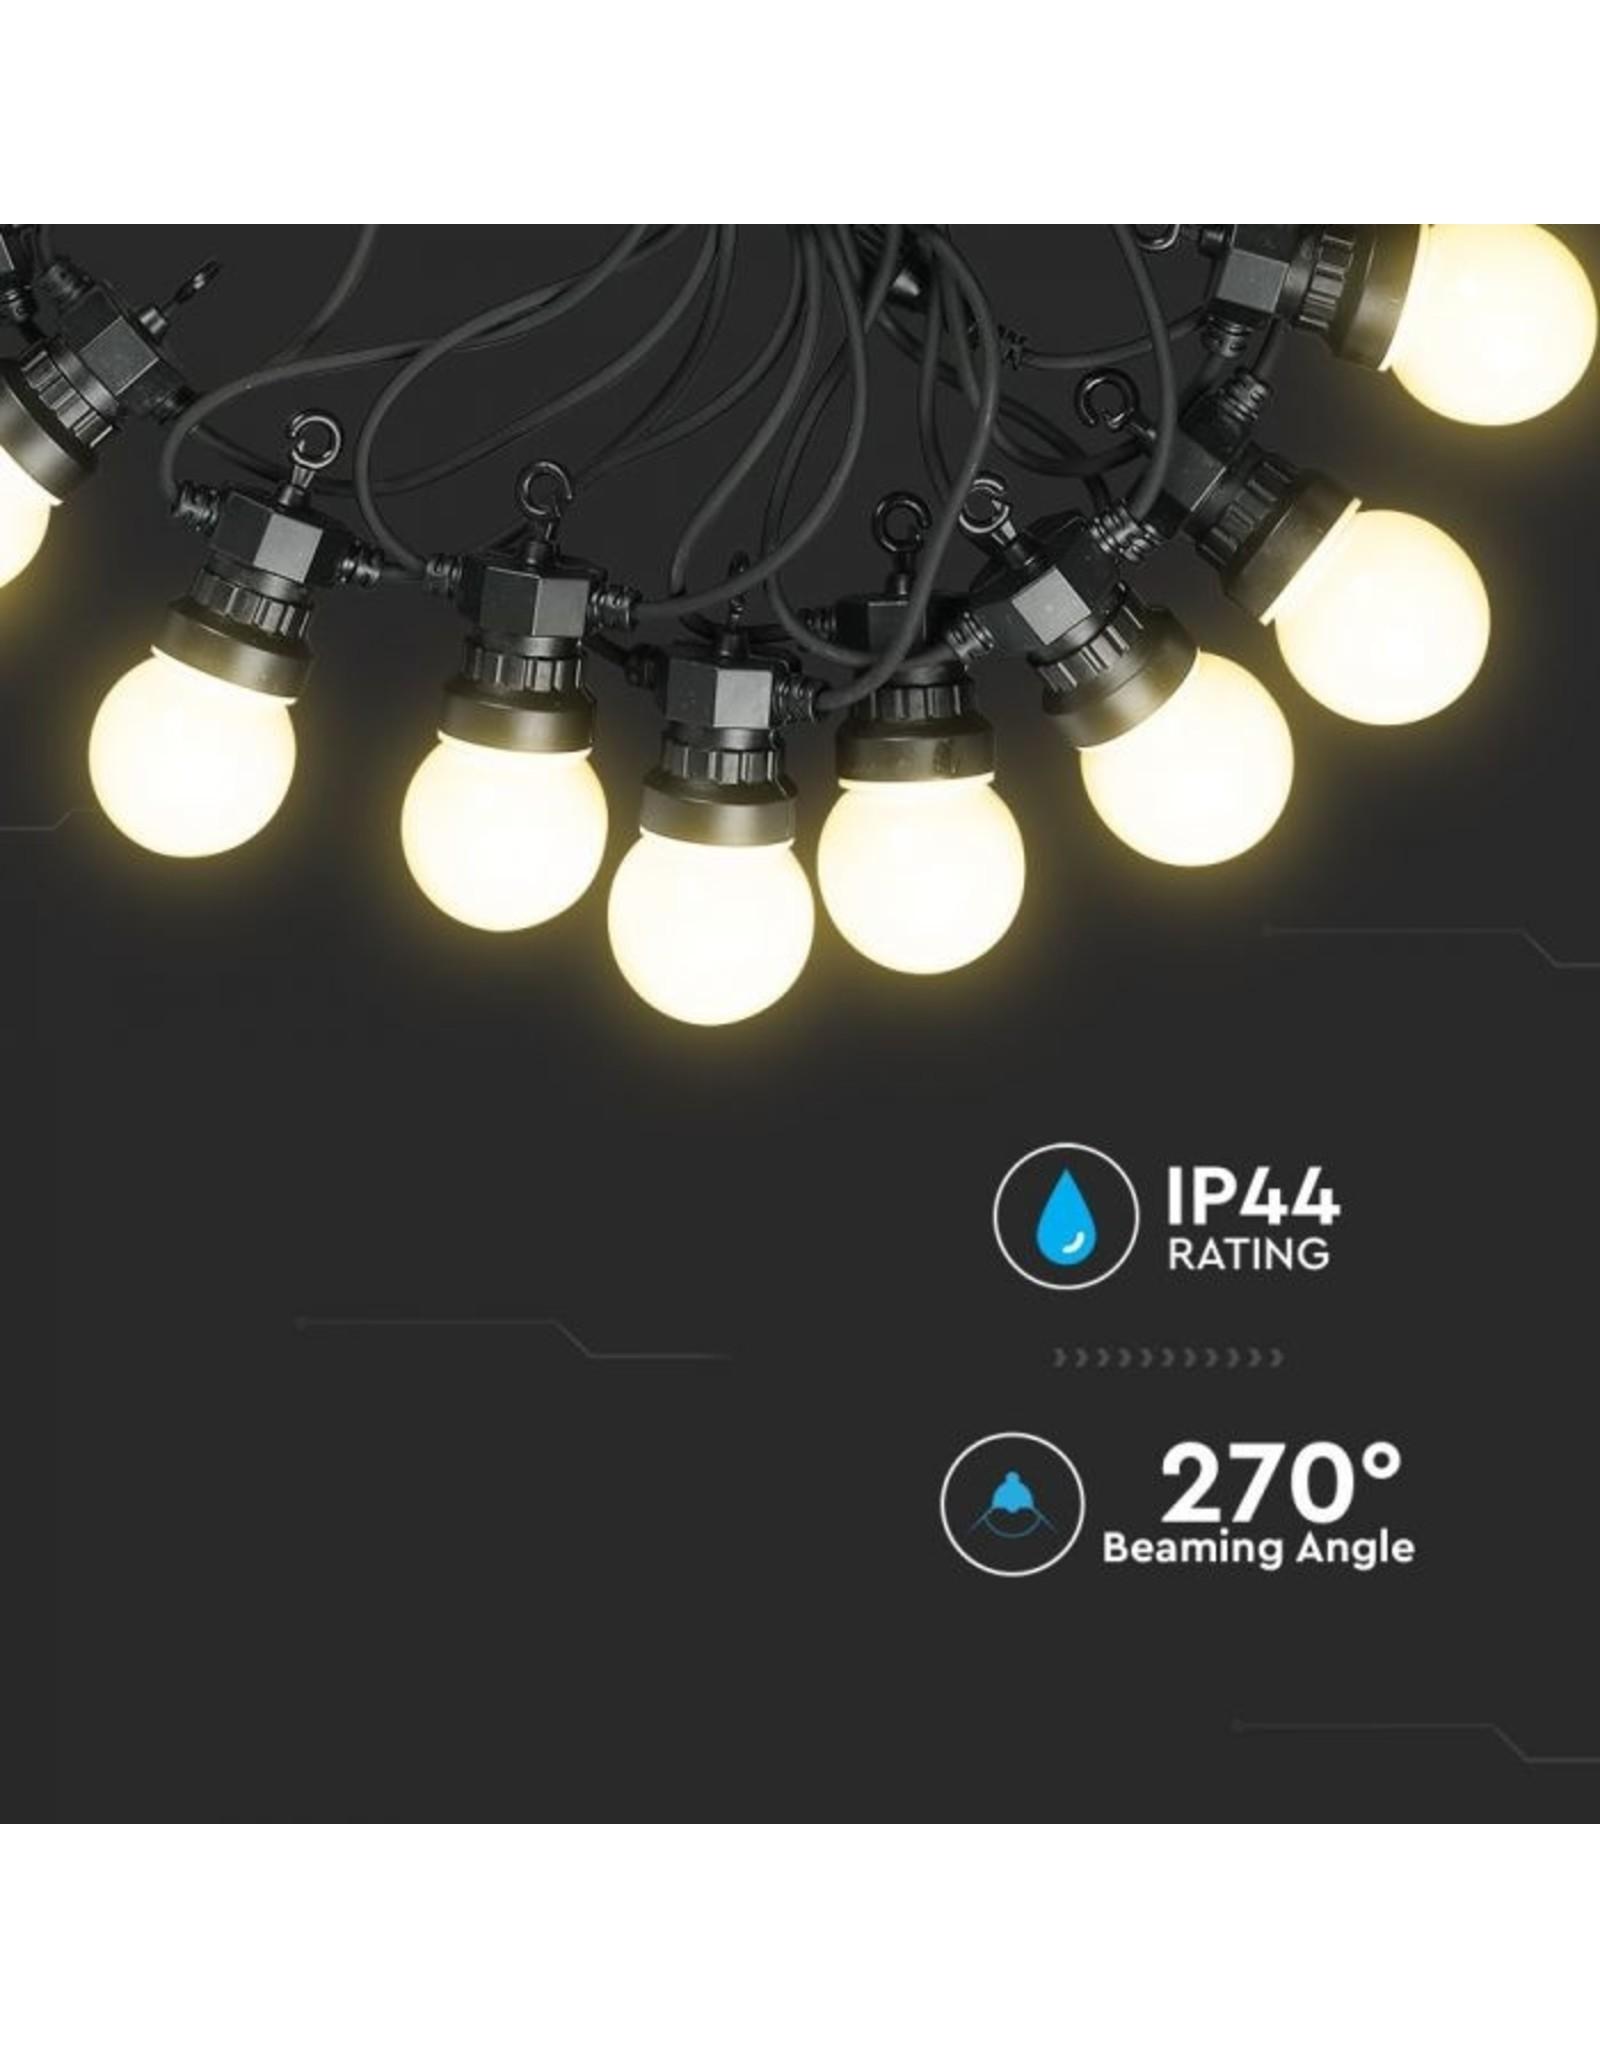 V-tac V-tac VT-70510 LED 5 meter - Warm White